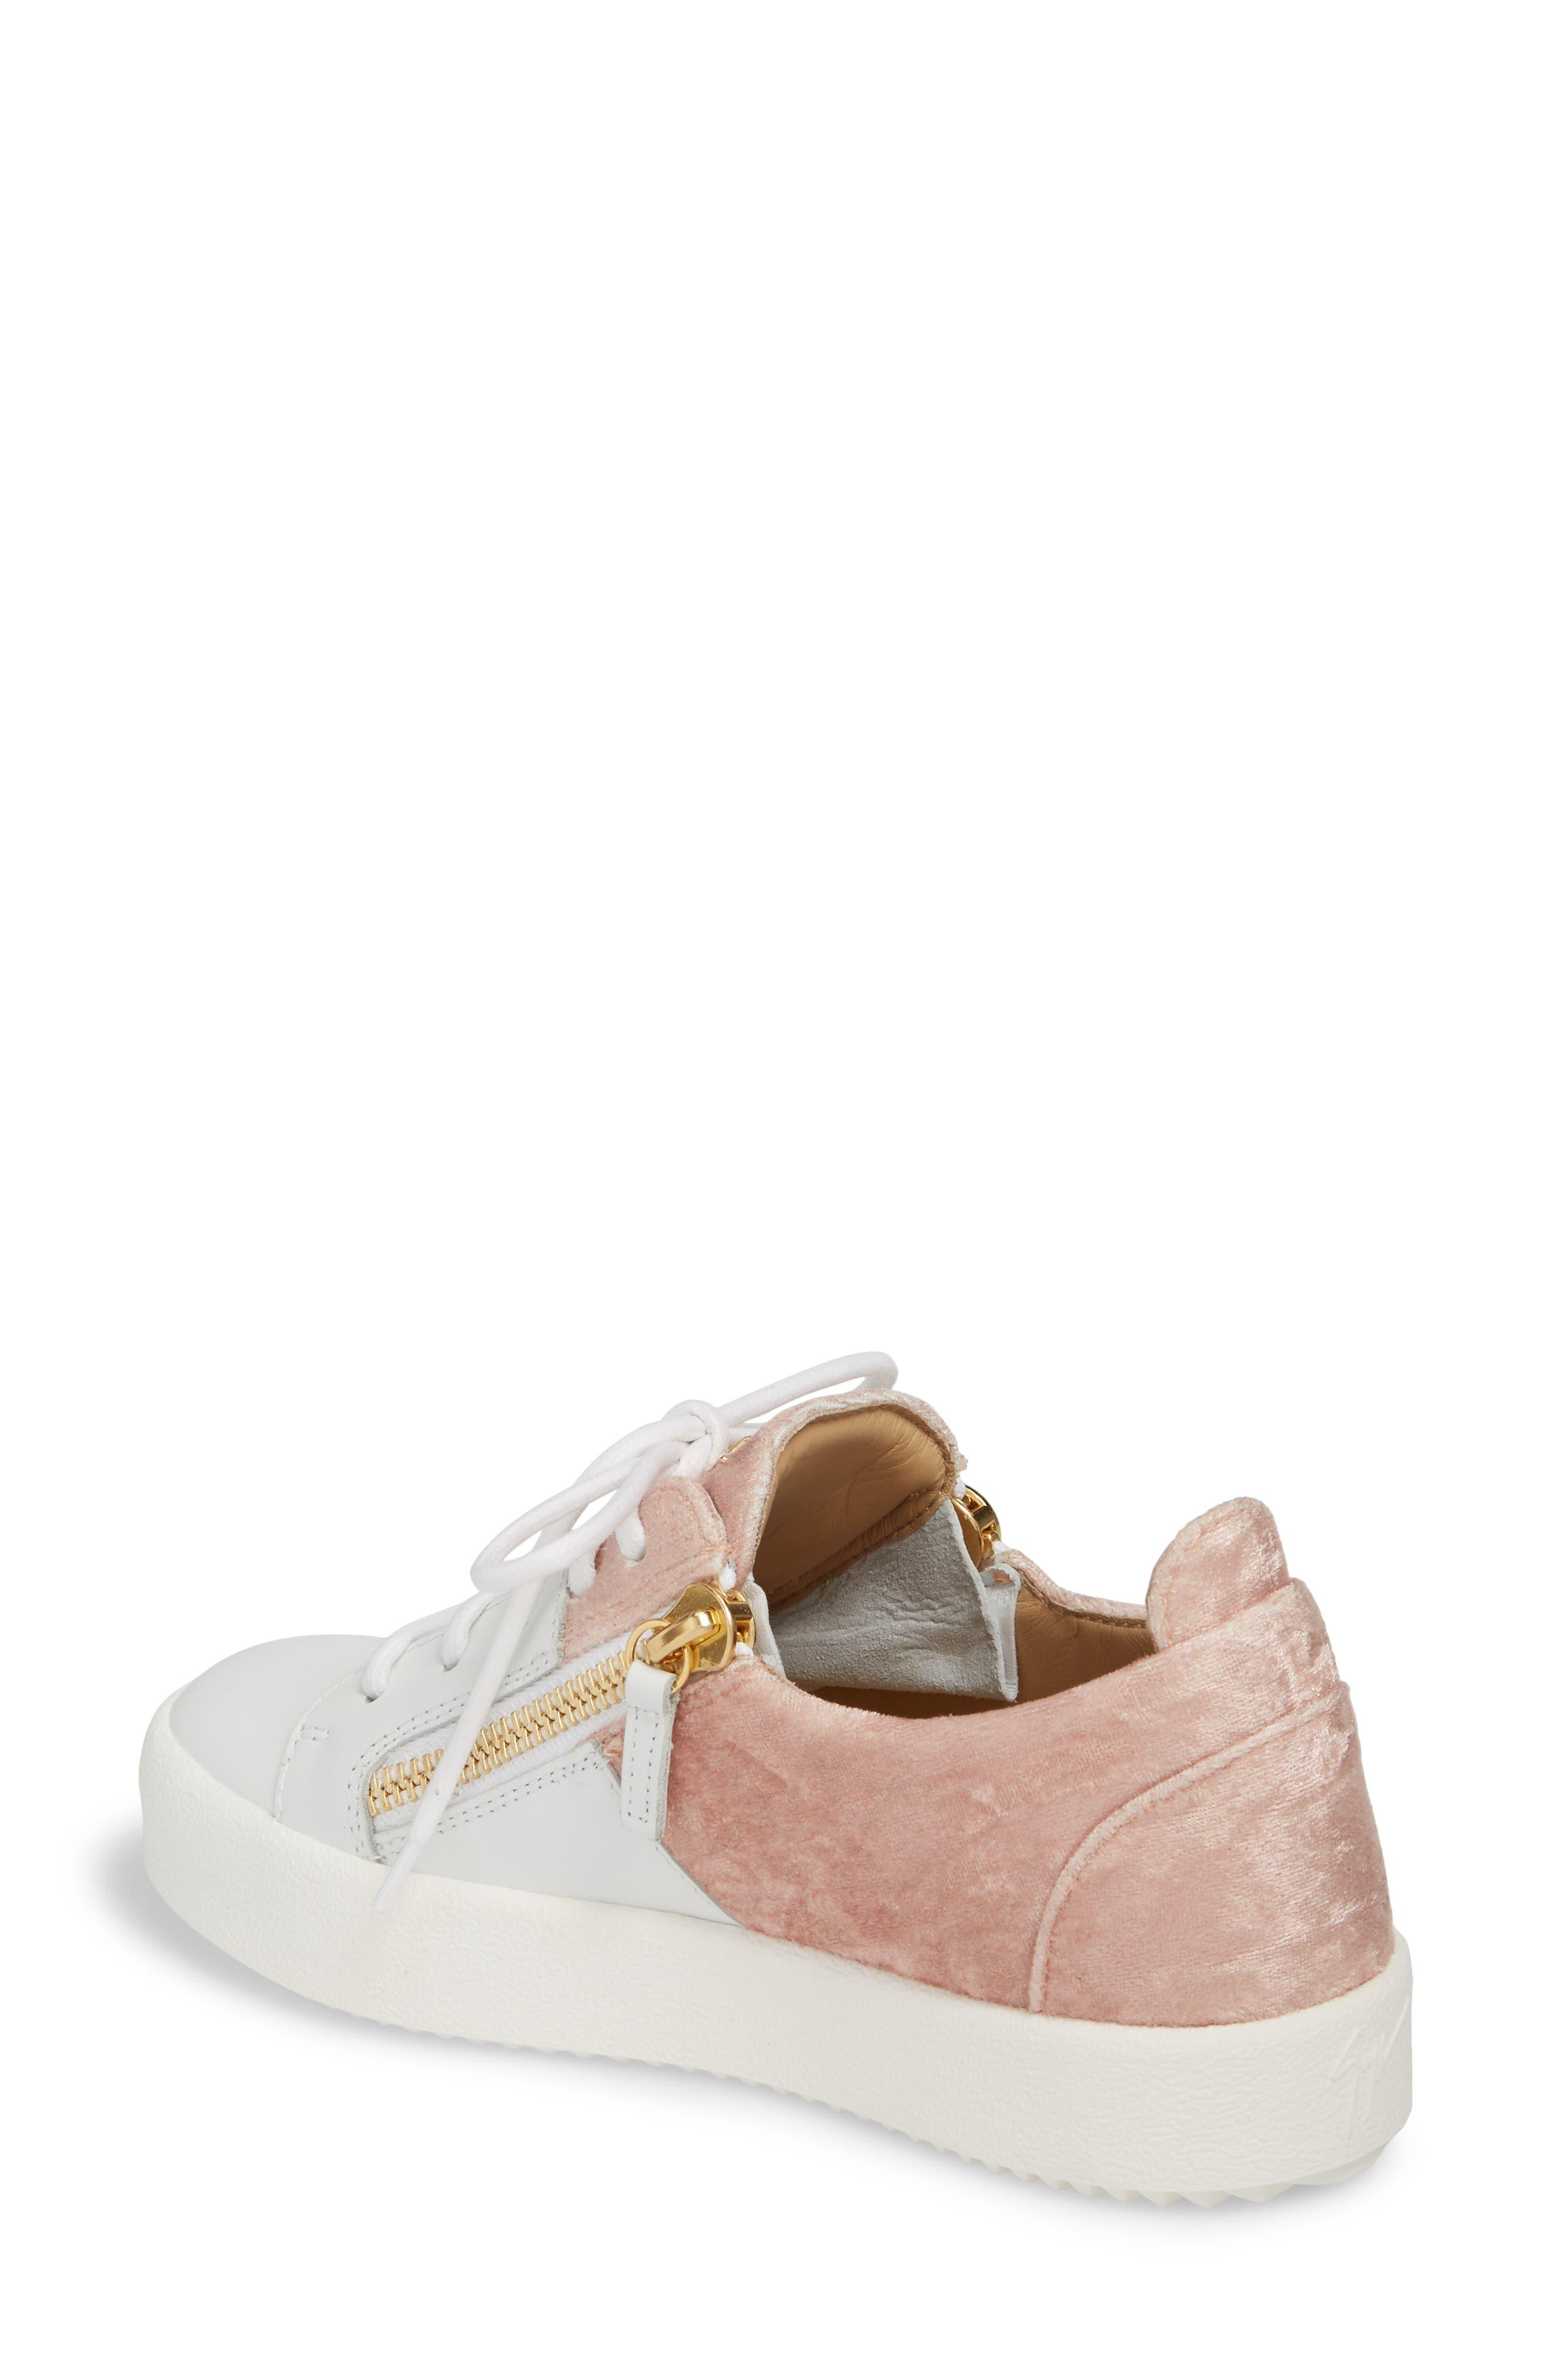 Mid Top Platform Sneaker,                             Alternate thumbnail 2, color,                             650